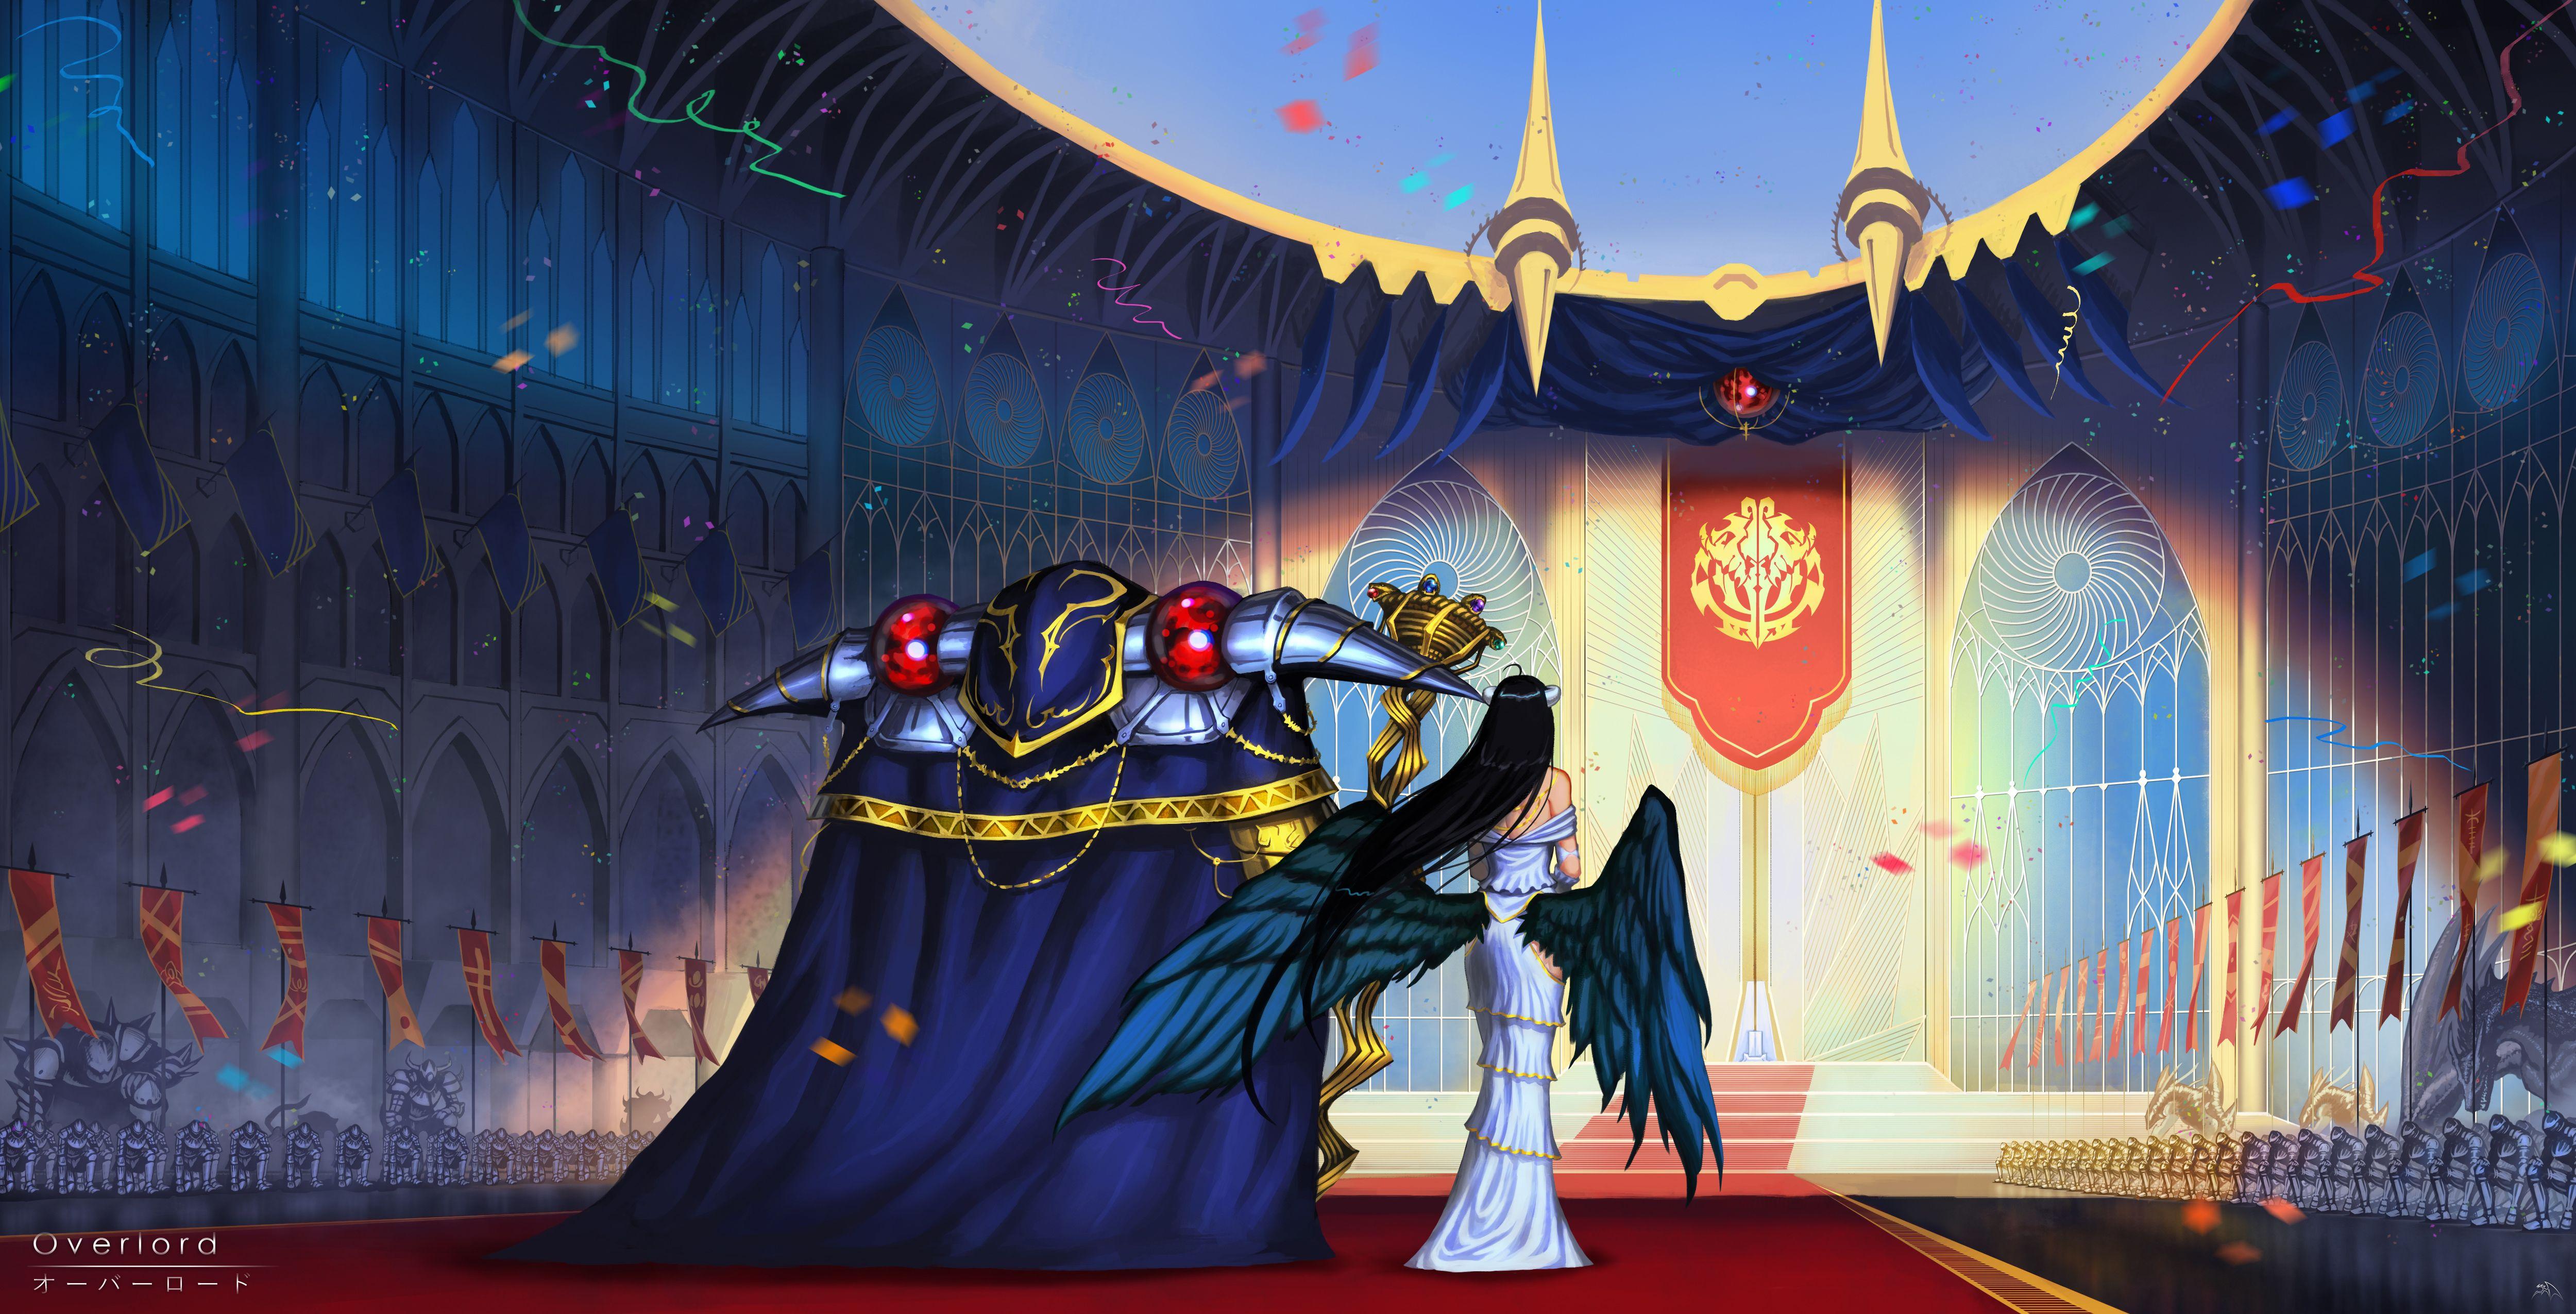 Ultra Hd Overlord Albedo Wallpaper Gambarku